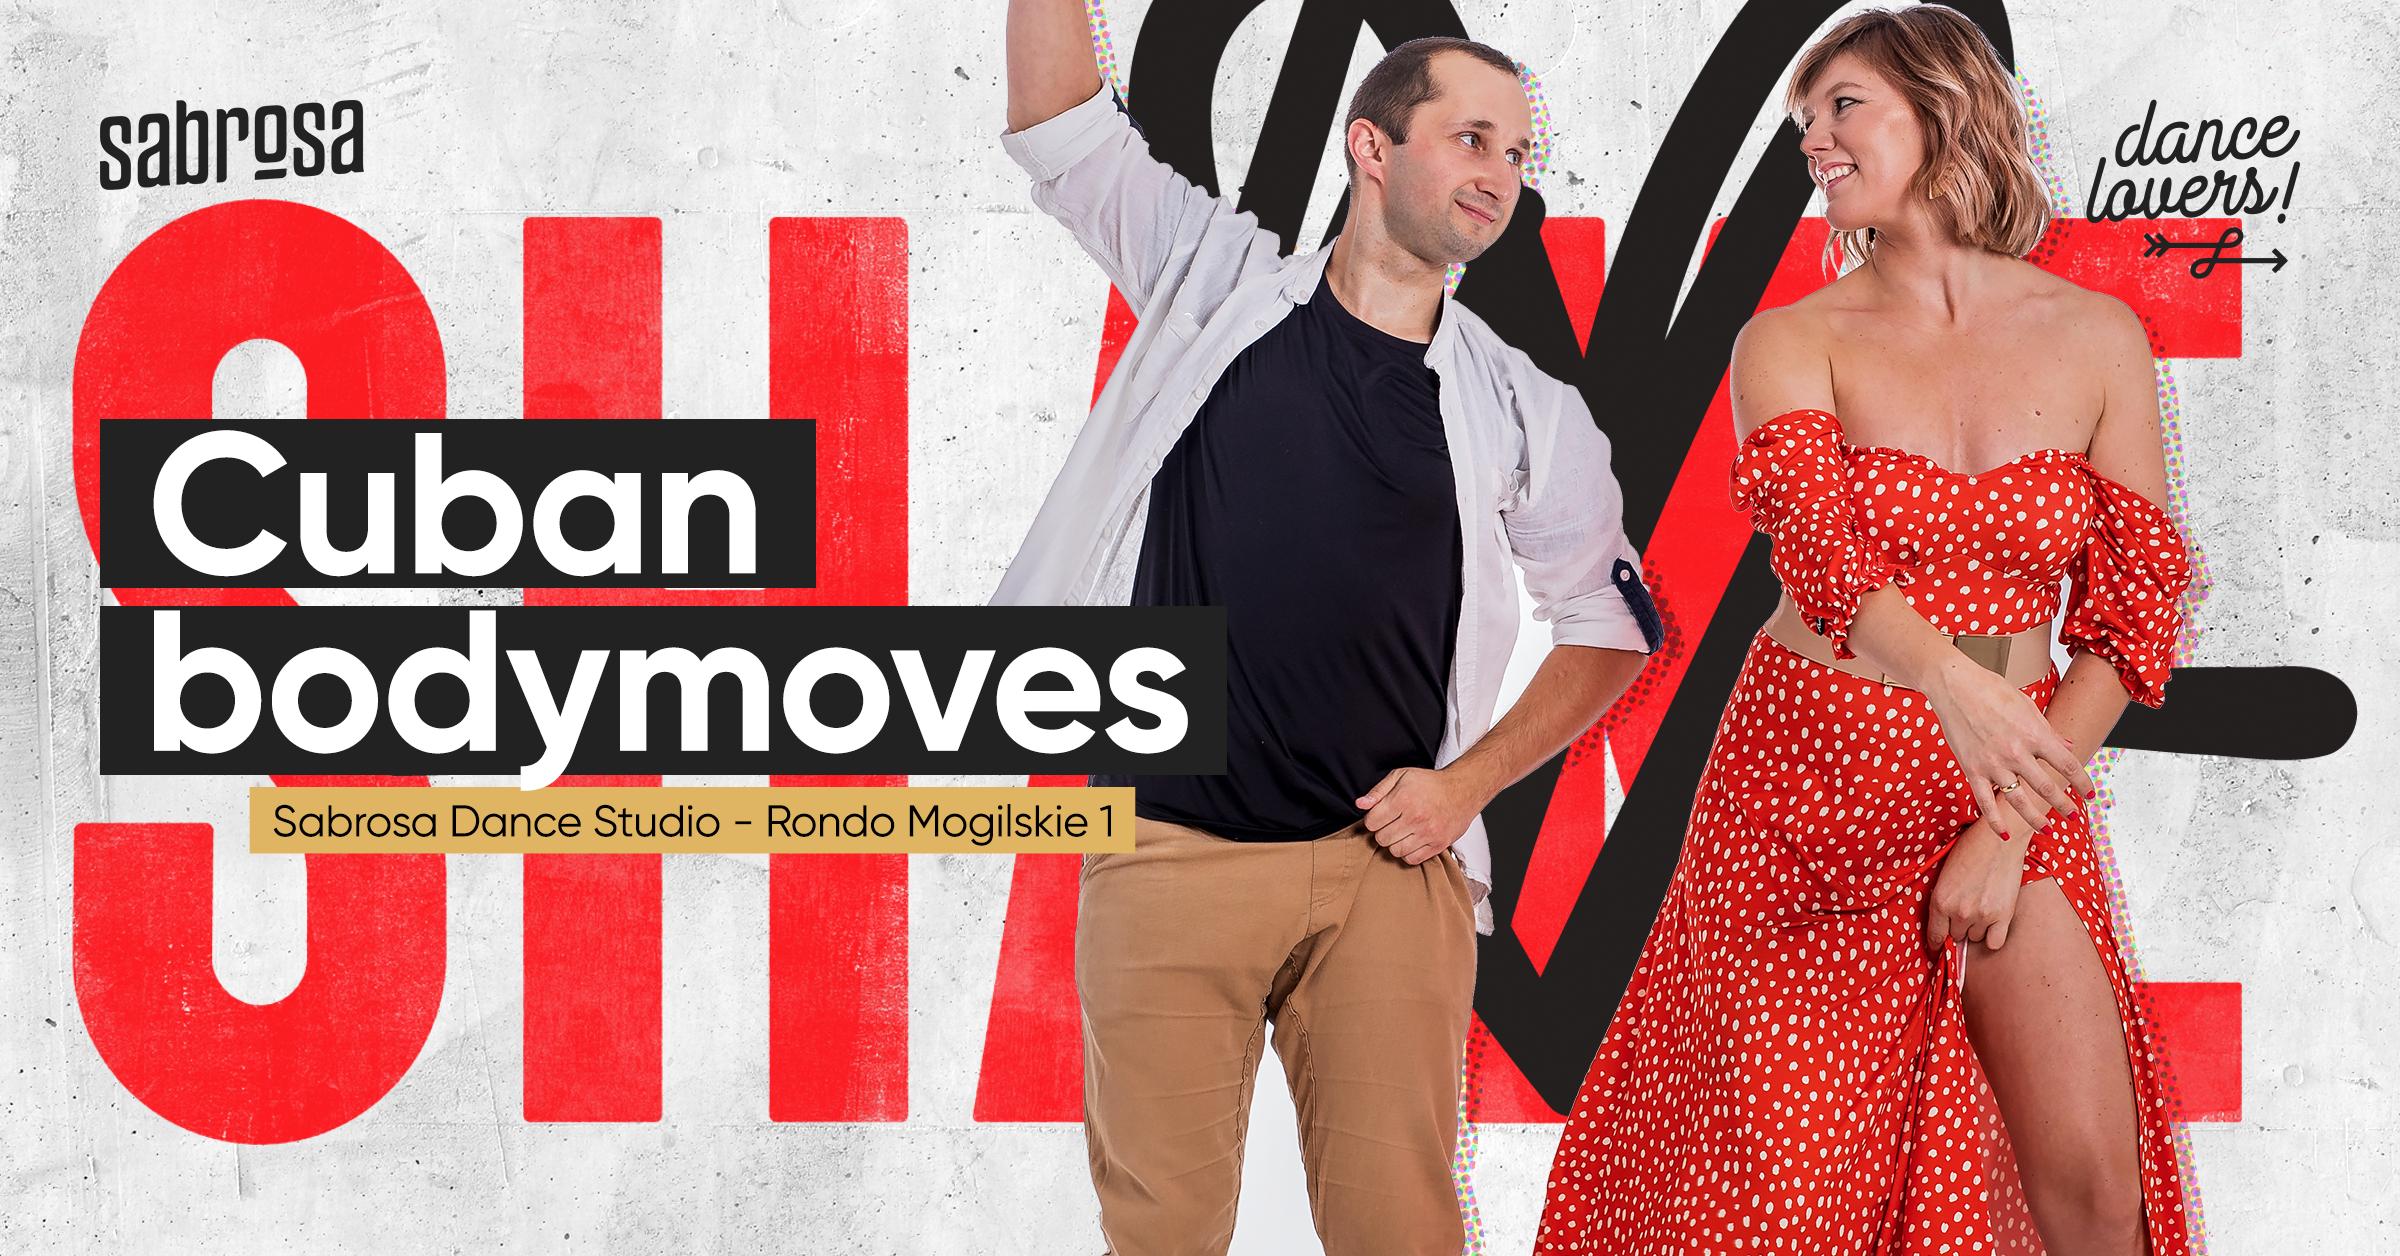 Cuban Bodymoves w Salsa Sabrosa Dance Studio - Kraków